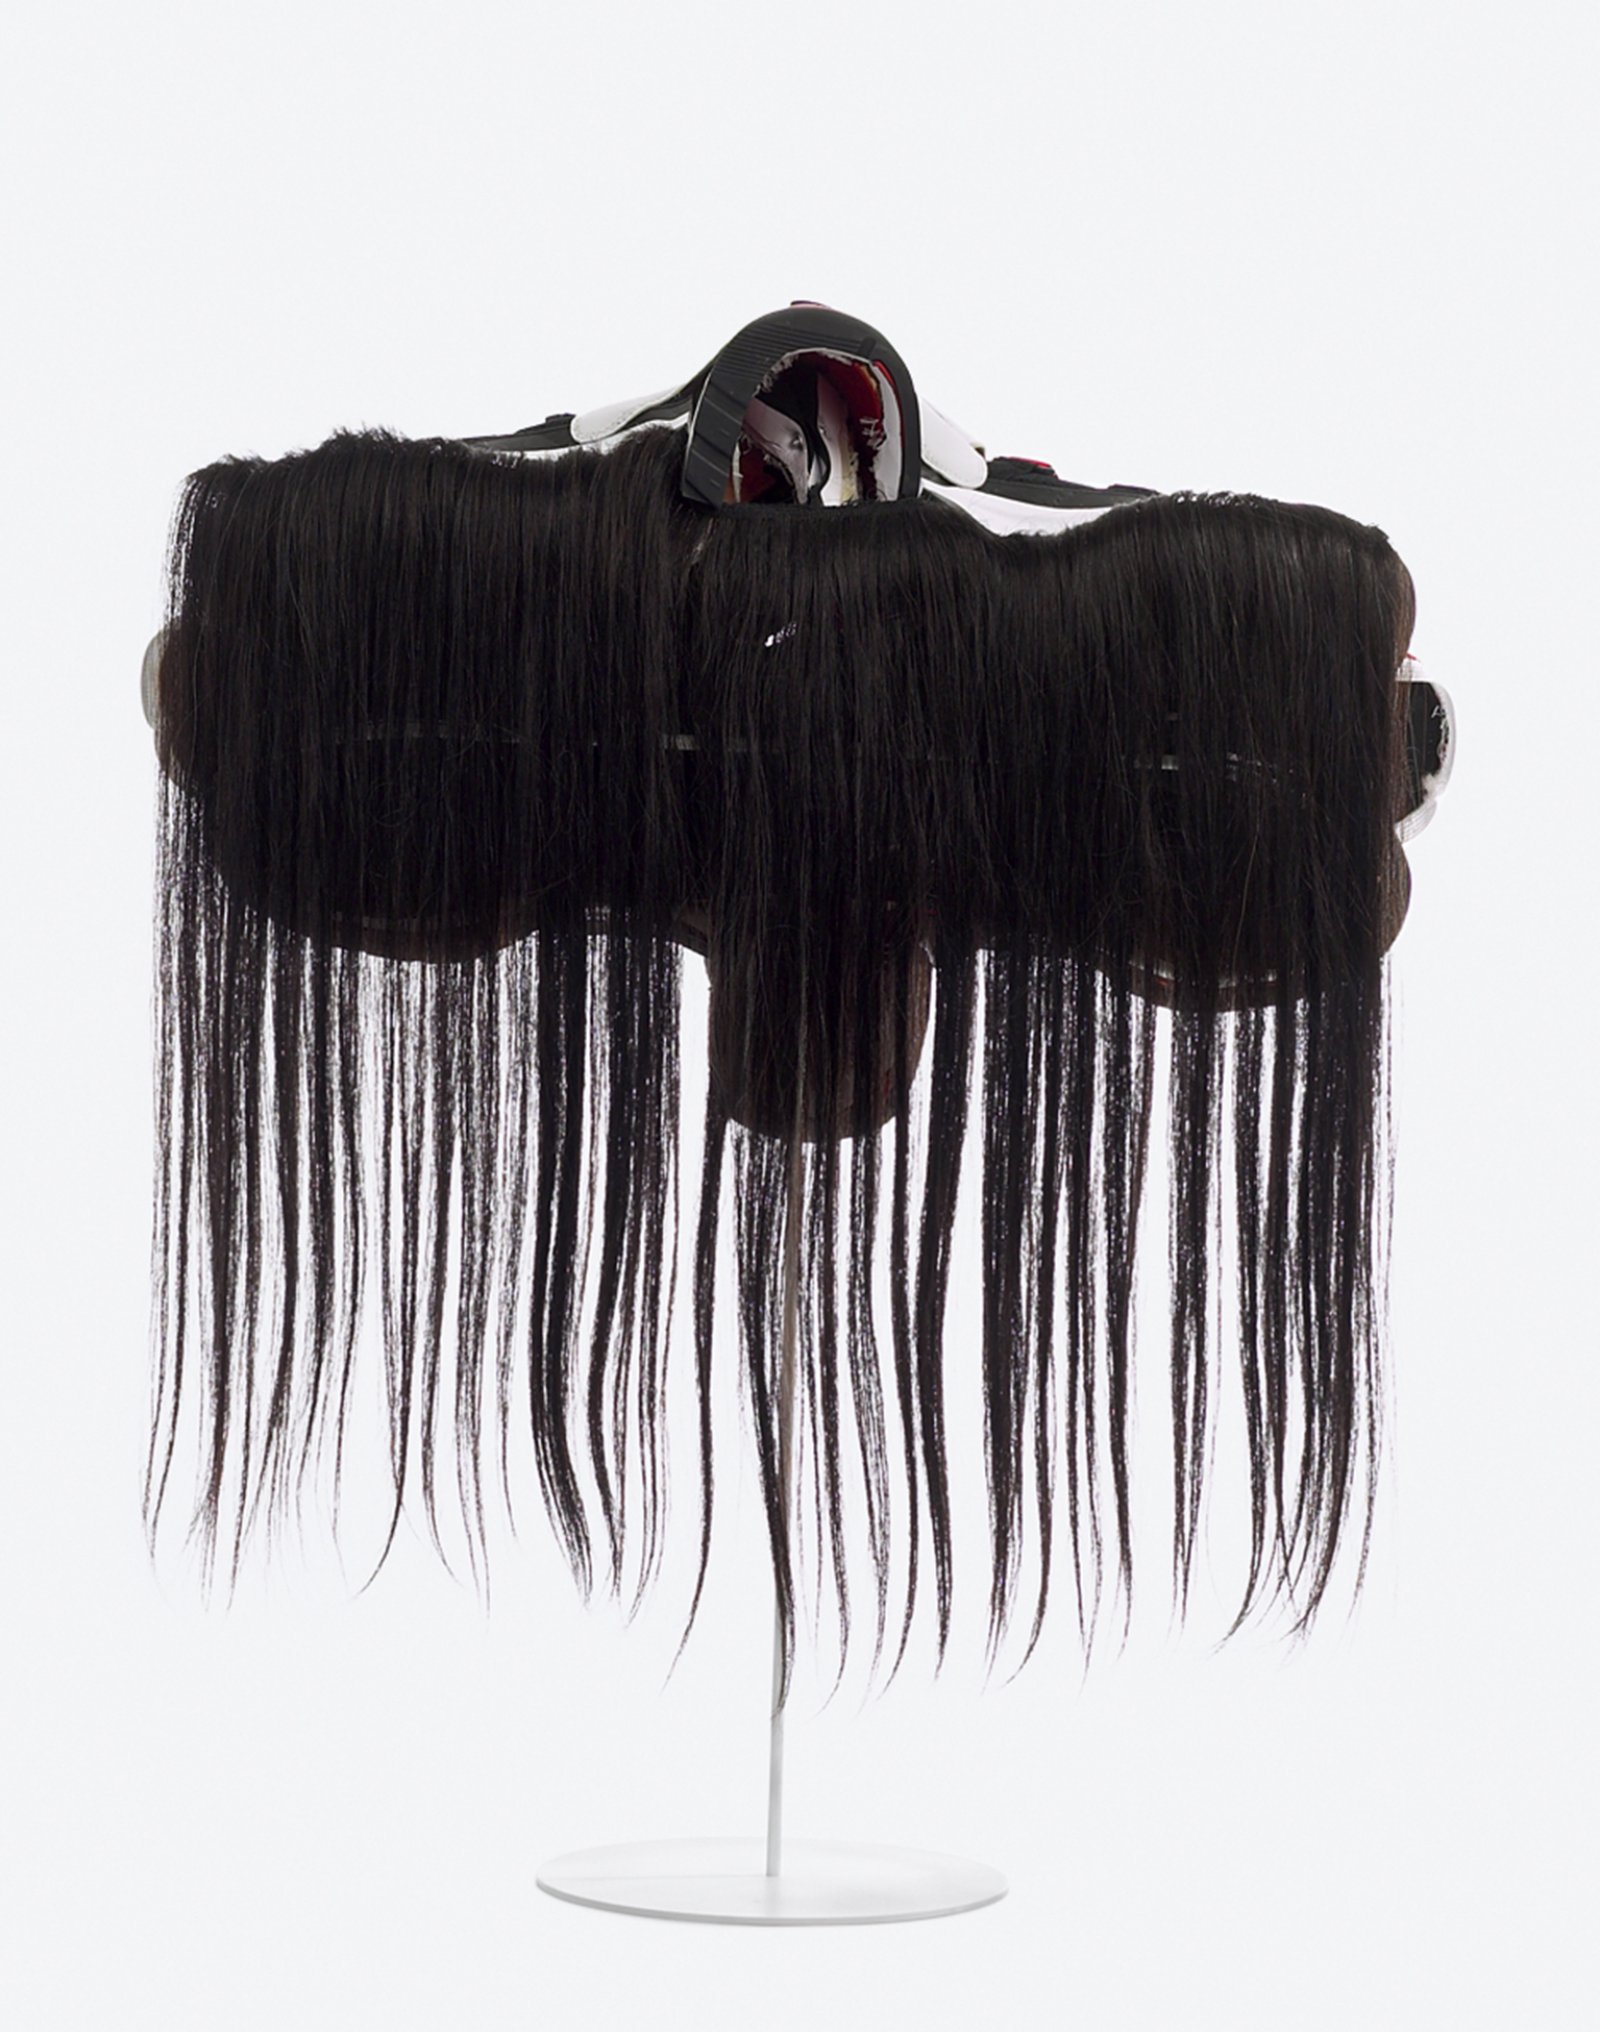 Brian Jungen,Prototype for New Understanding #11, 2002, nike air jordans, human hair, 26 x 23 x 10 in. (67 x 58 x 25 cm)